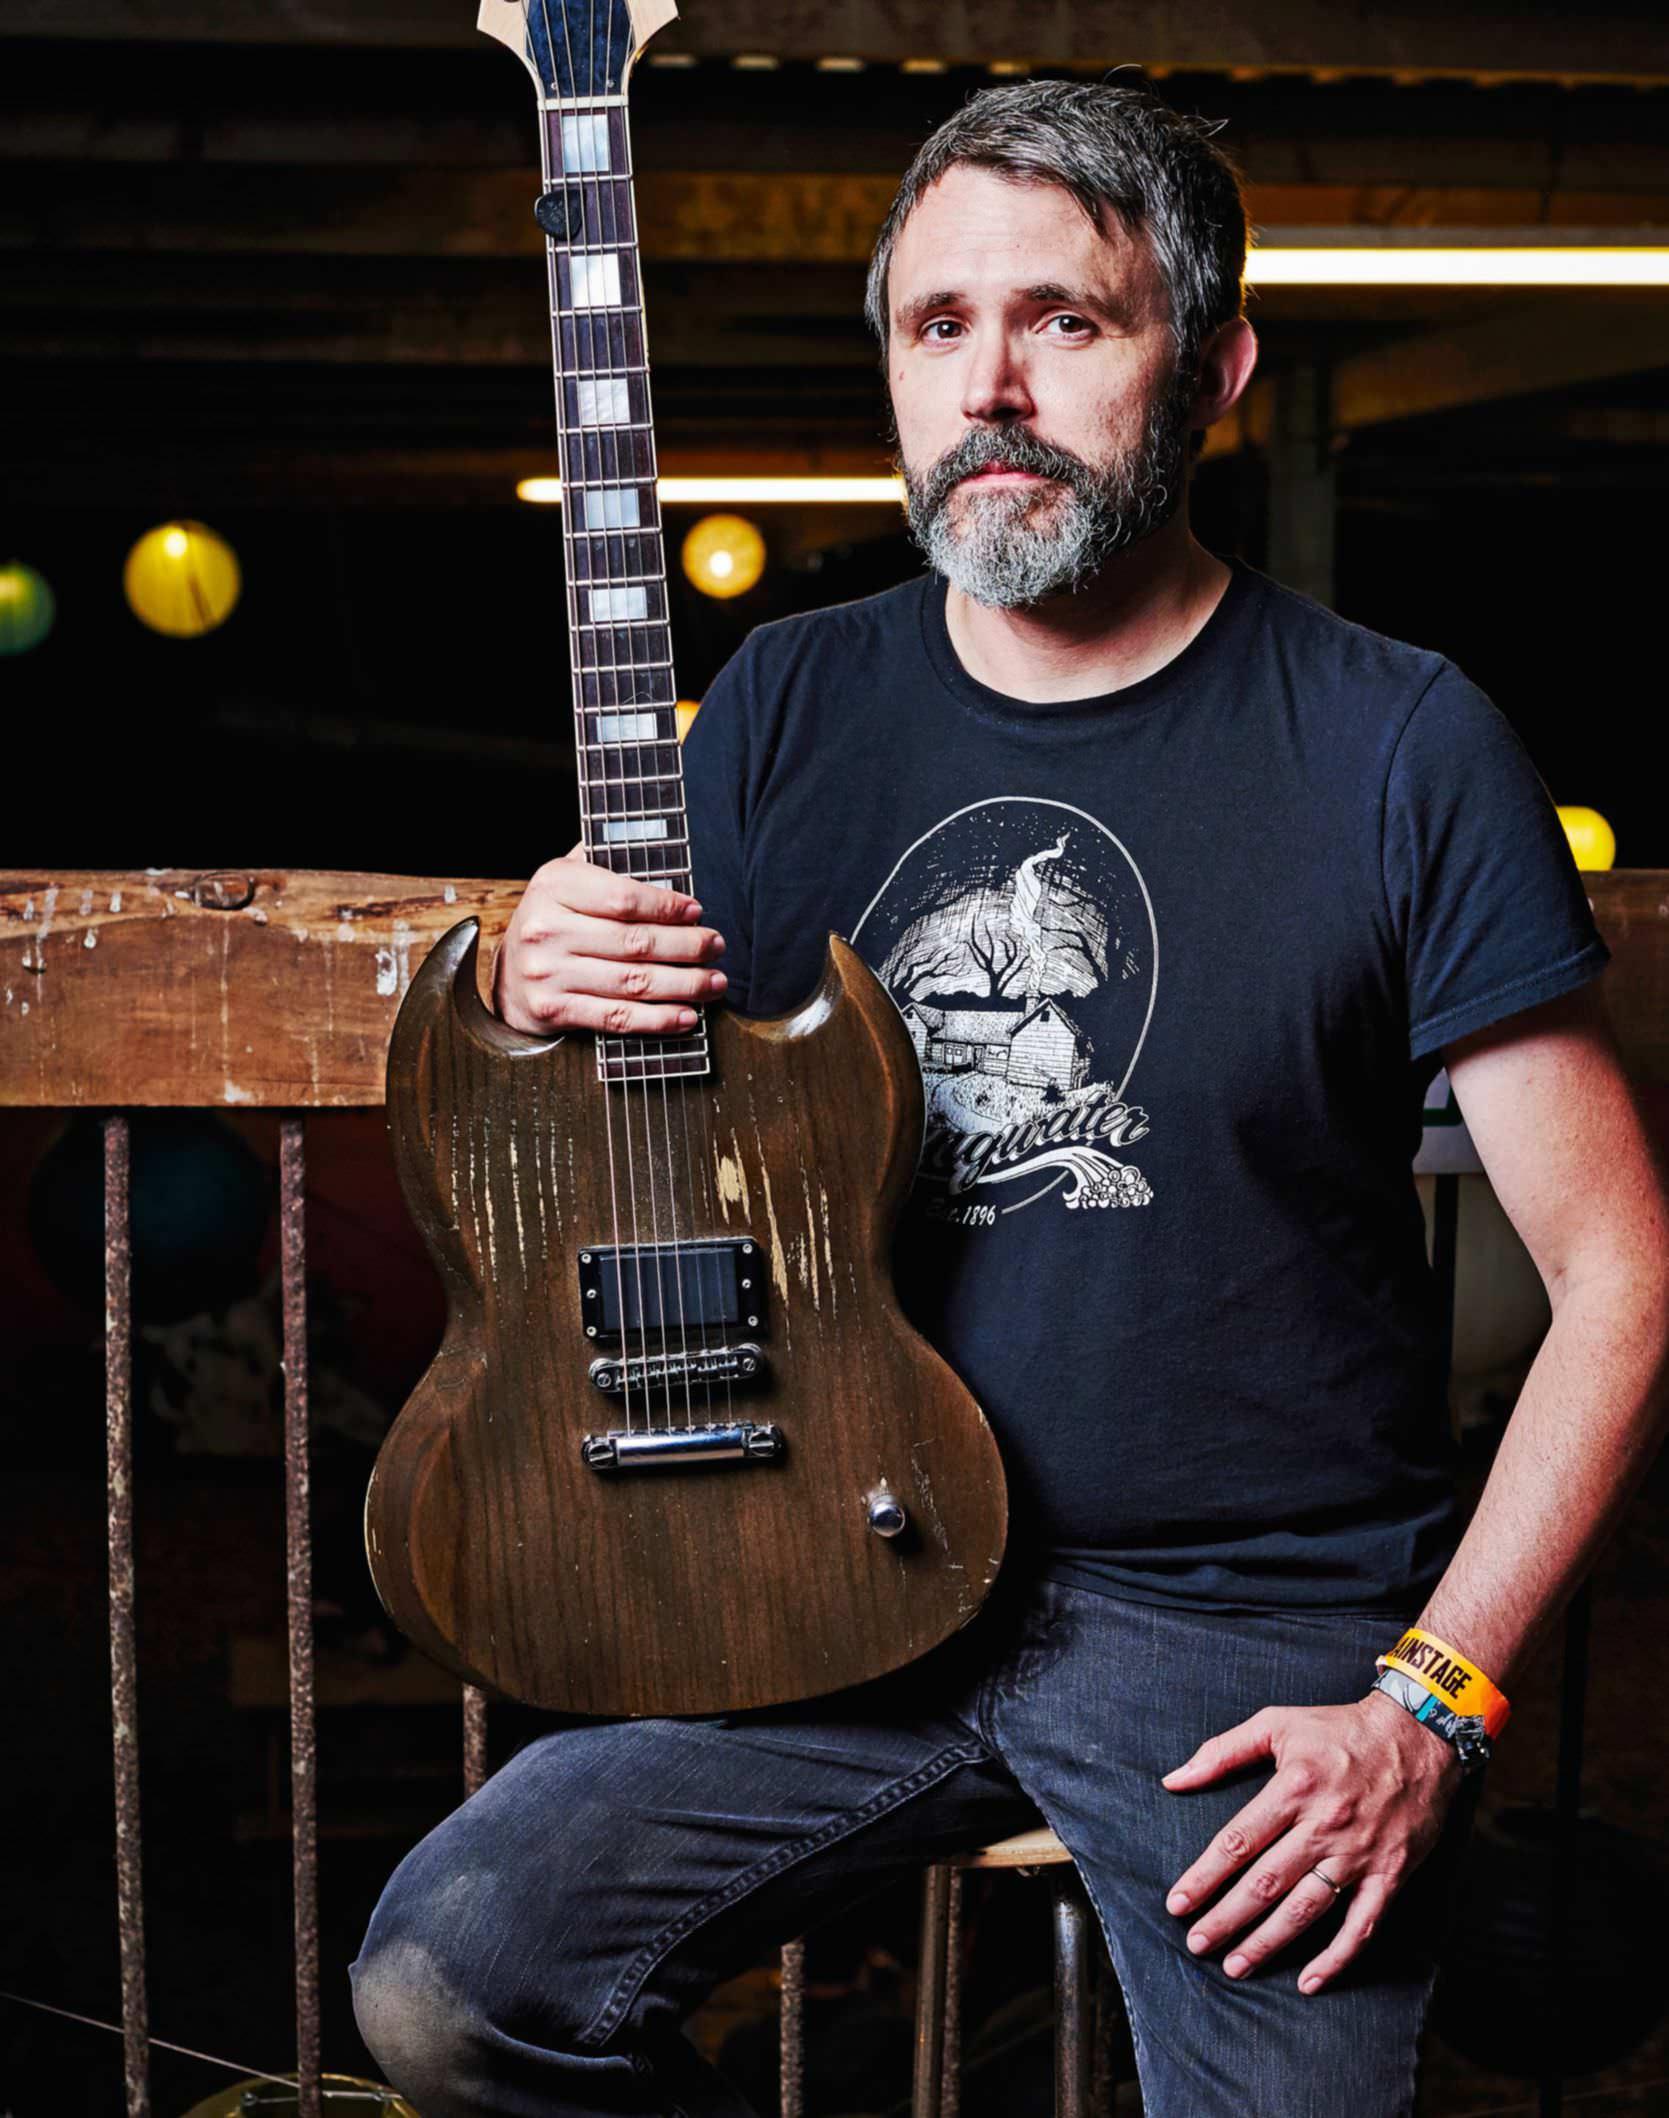 Me And My Guitar - Dallas Thomas